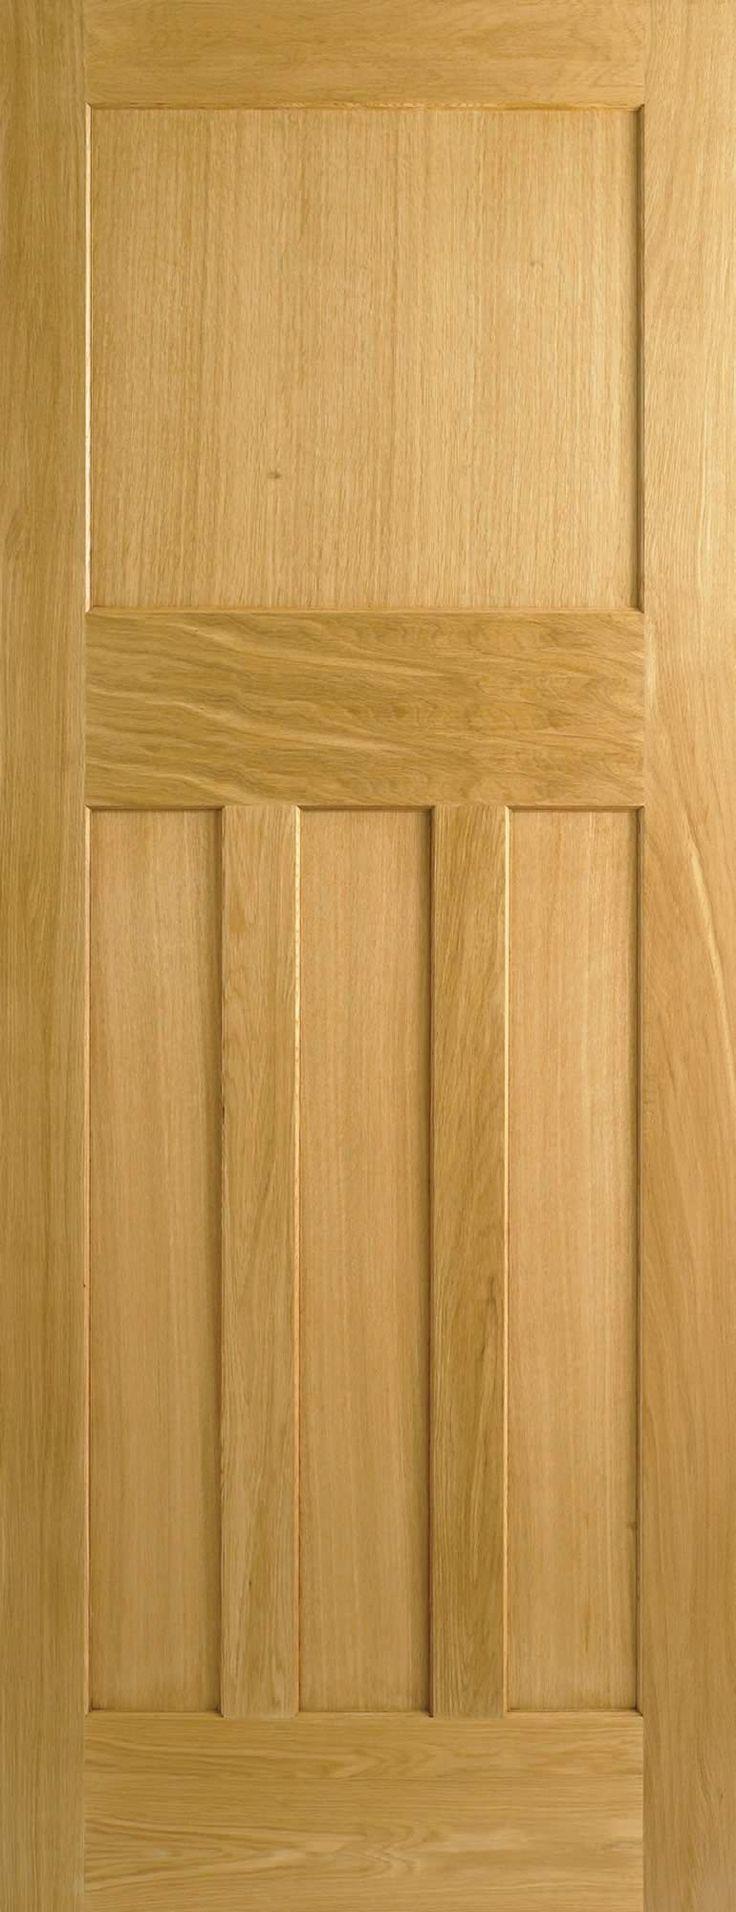 DX 30's Style Oak Nostagia Internal Fire Doors FD30